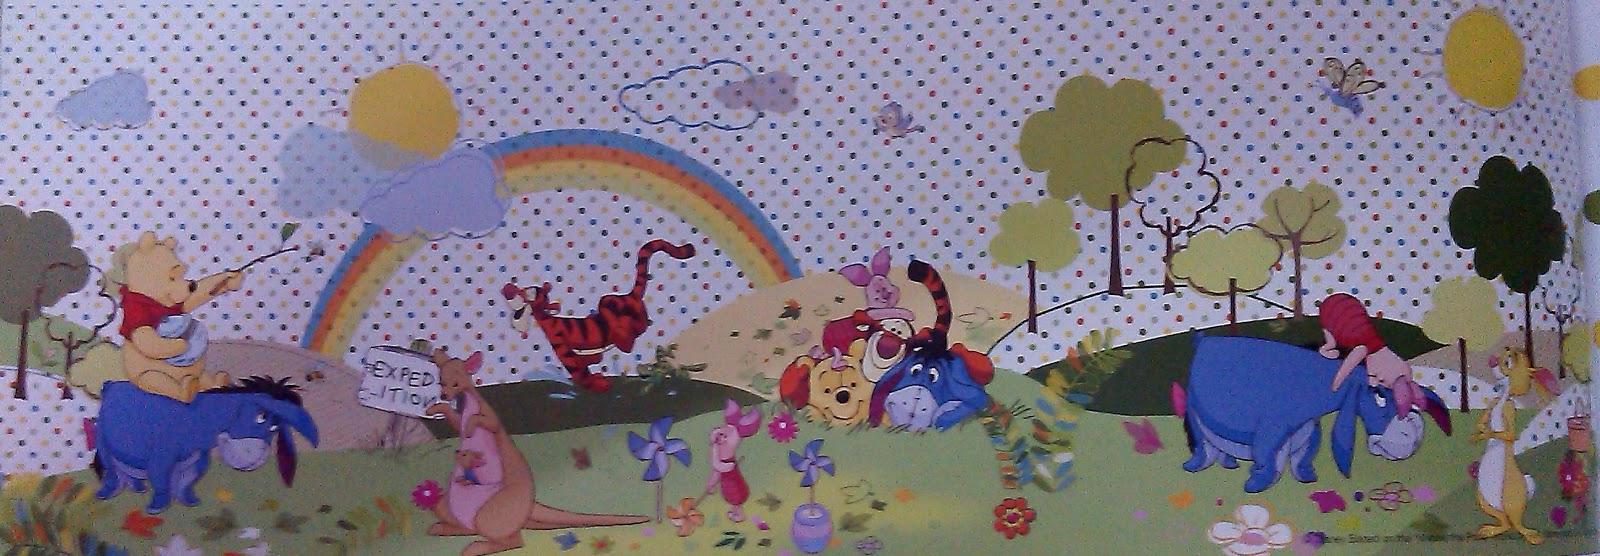 loveshine creations mural untuk bilik kanak kanak